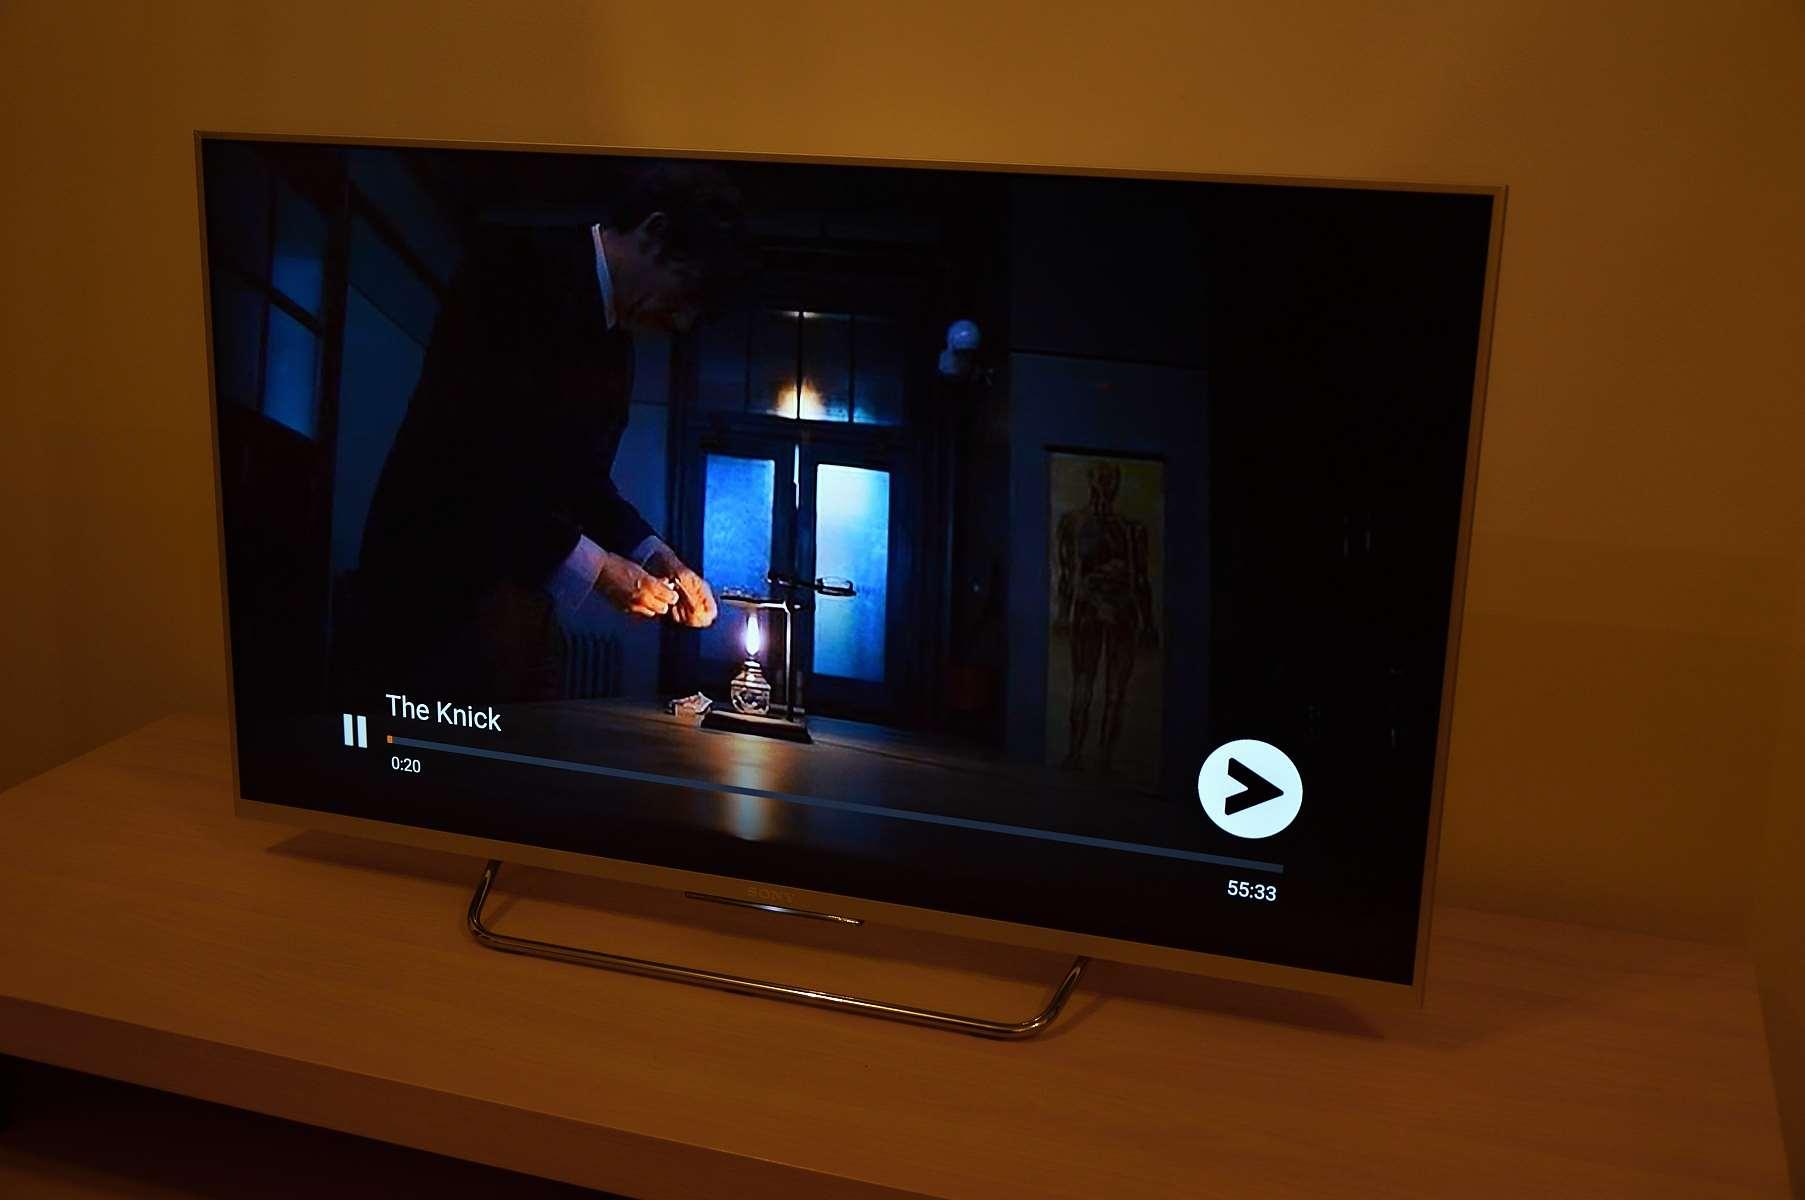 Chrome apk for sony android tv | Sony's New Bravia 4K TVs